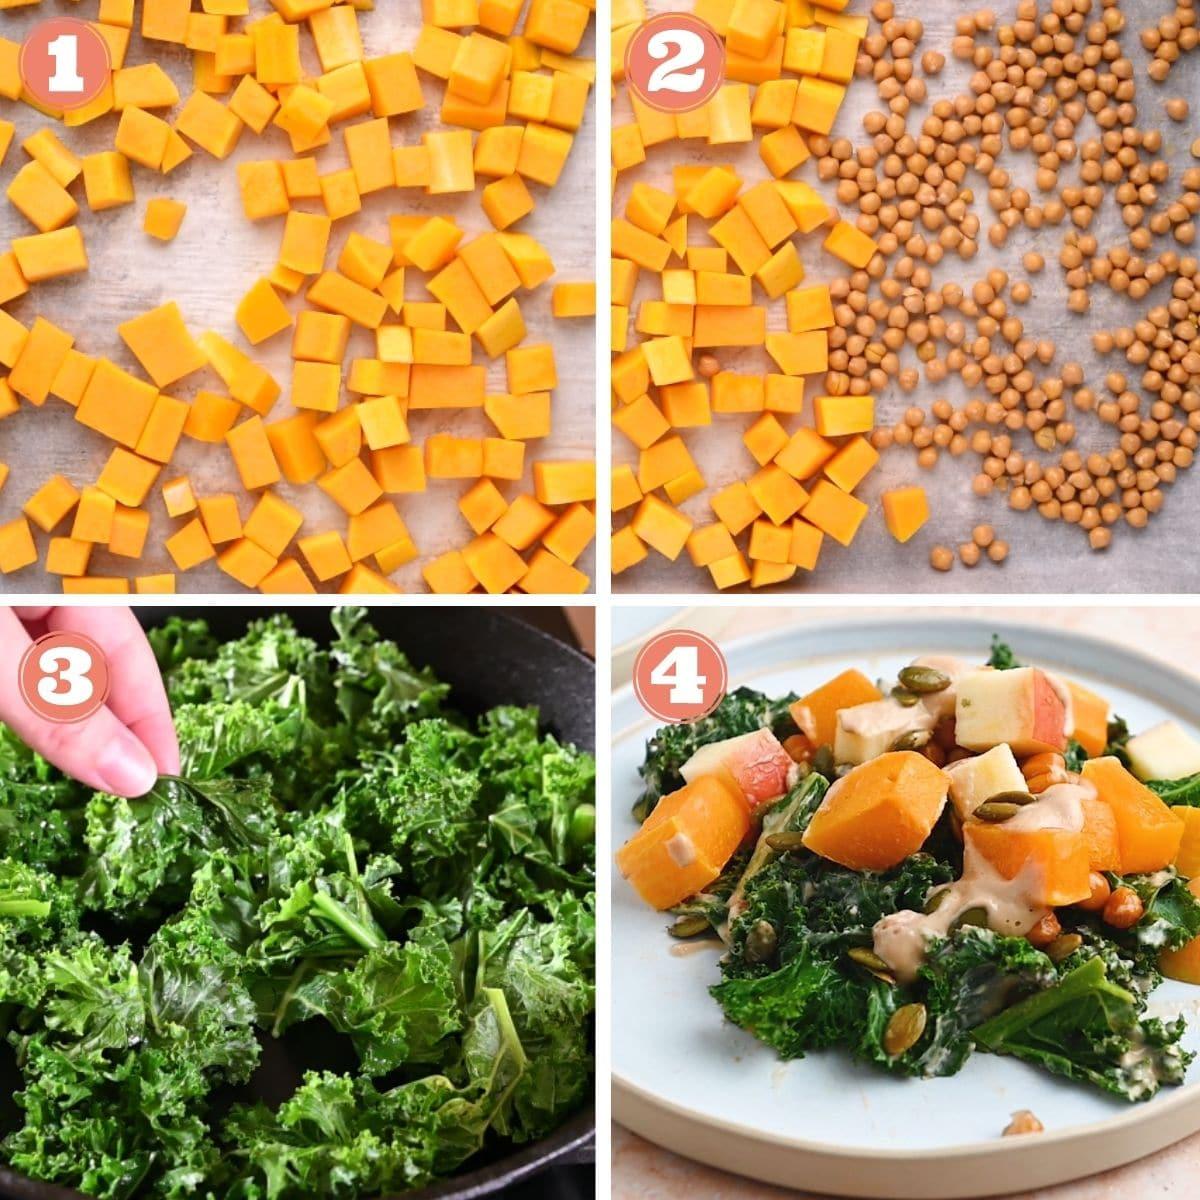 Steps 1 throug h 4 to make kale salad